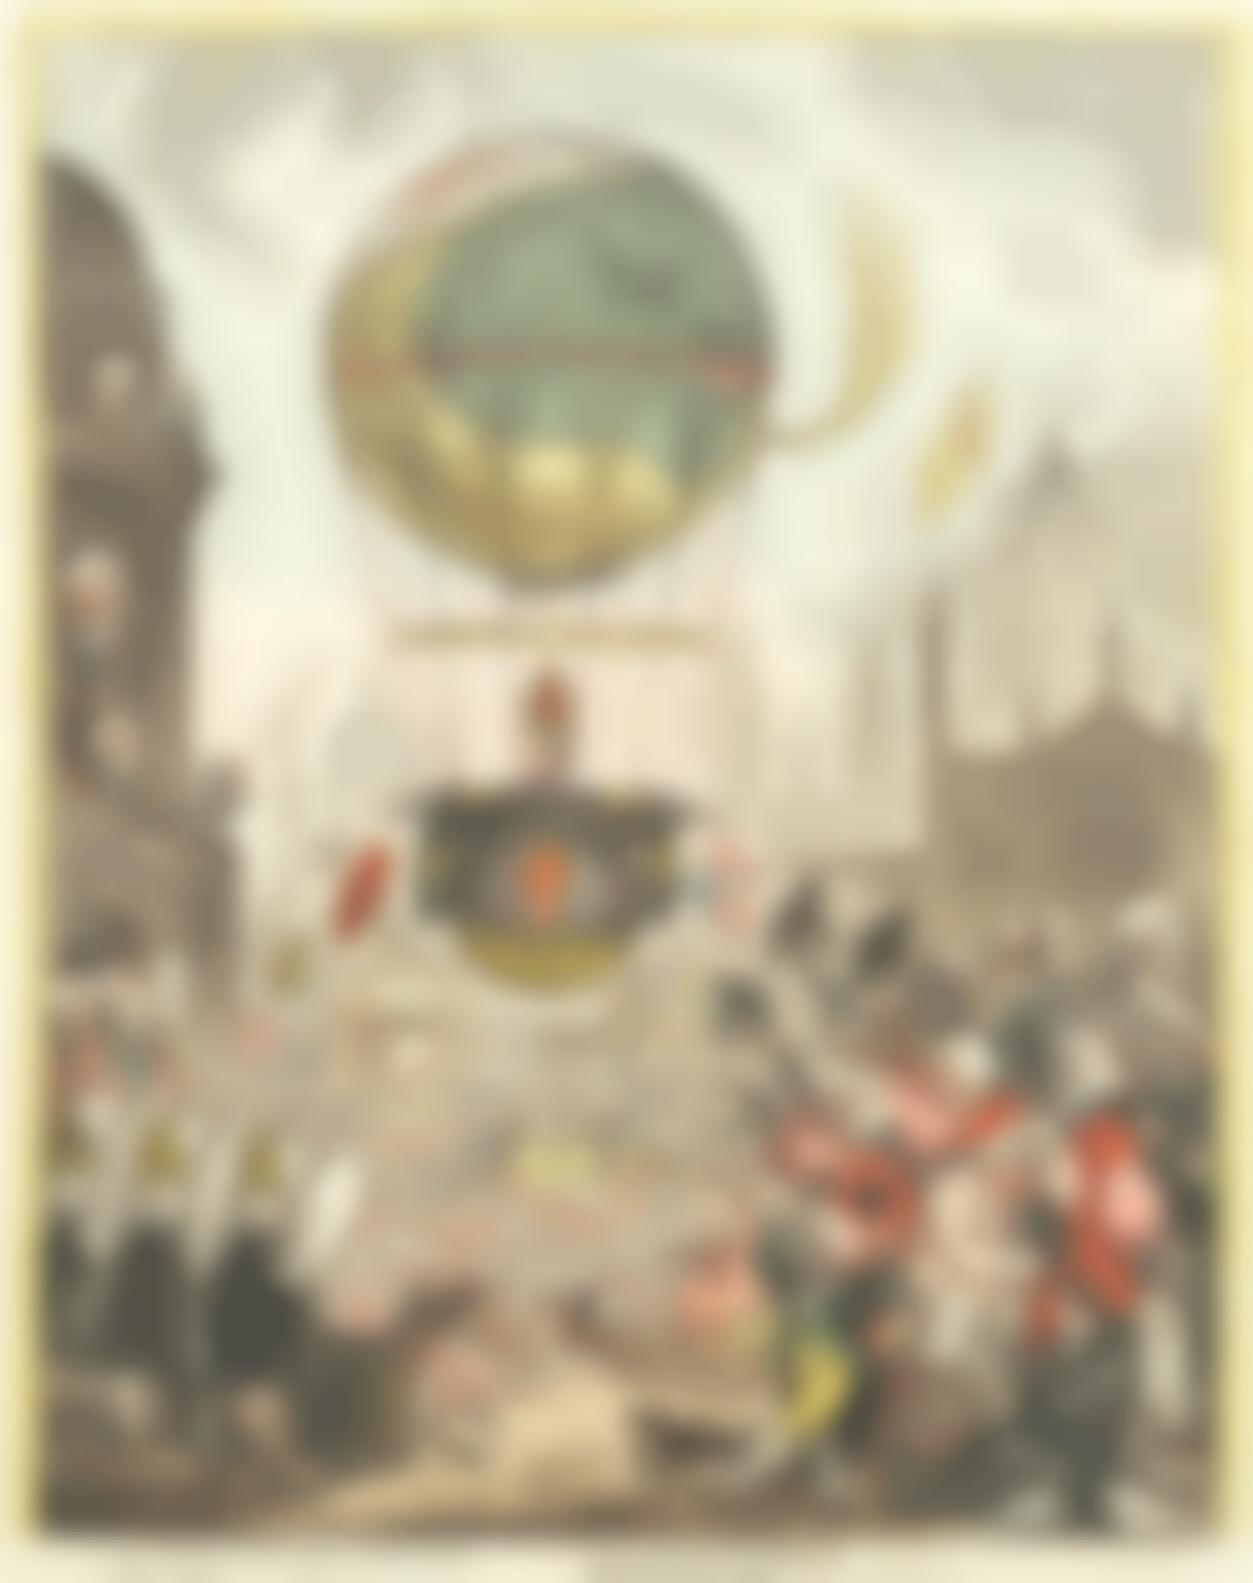 James Gillray-Tentanda Via Est Qua Me Quoque Possim Tollere Humo-1810